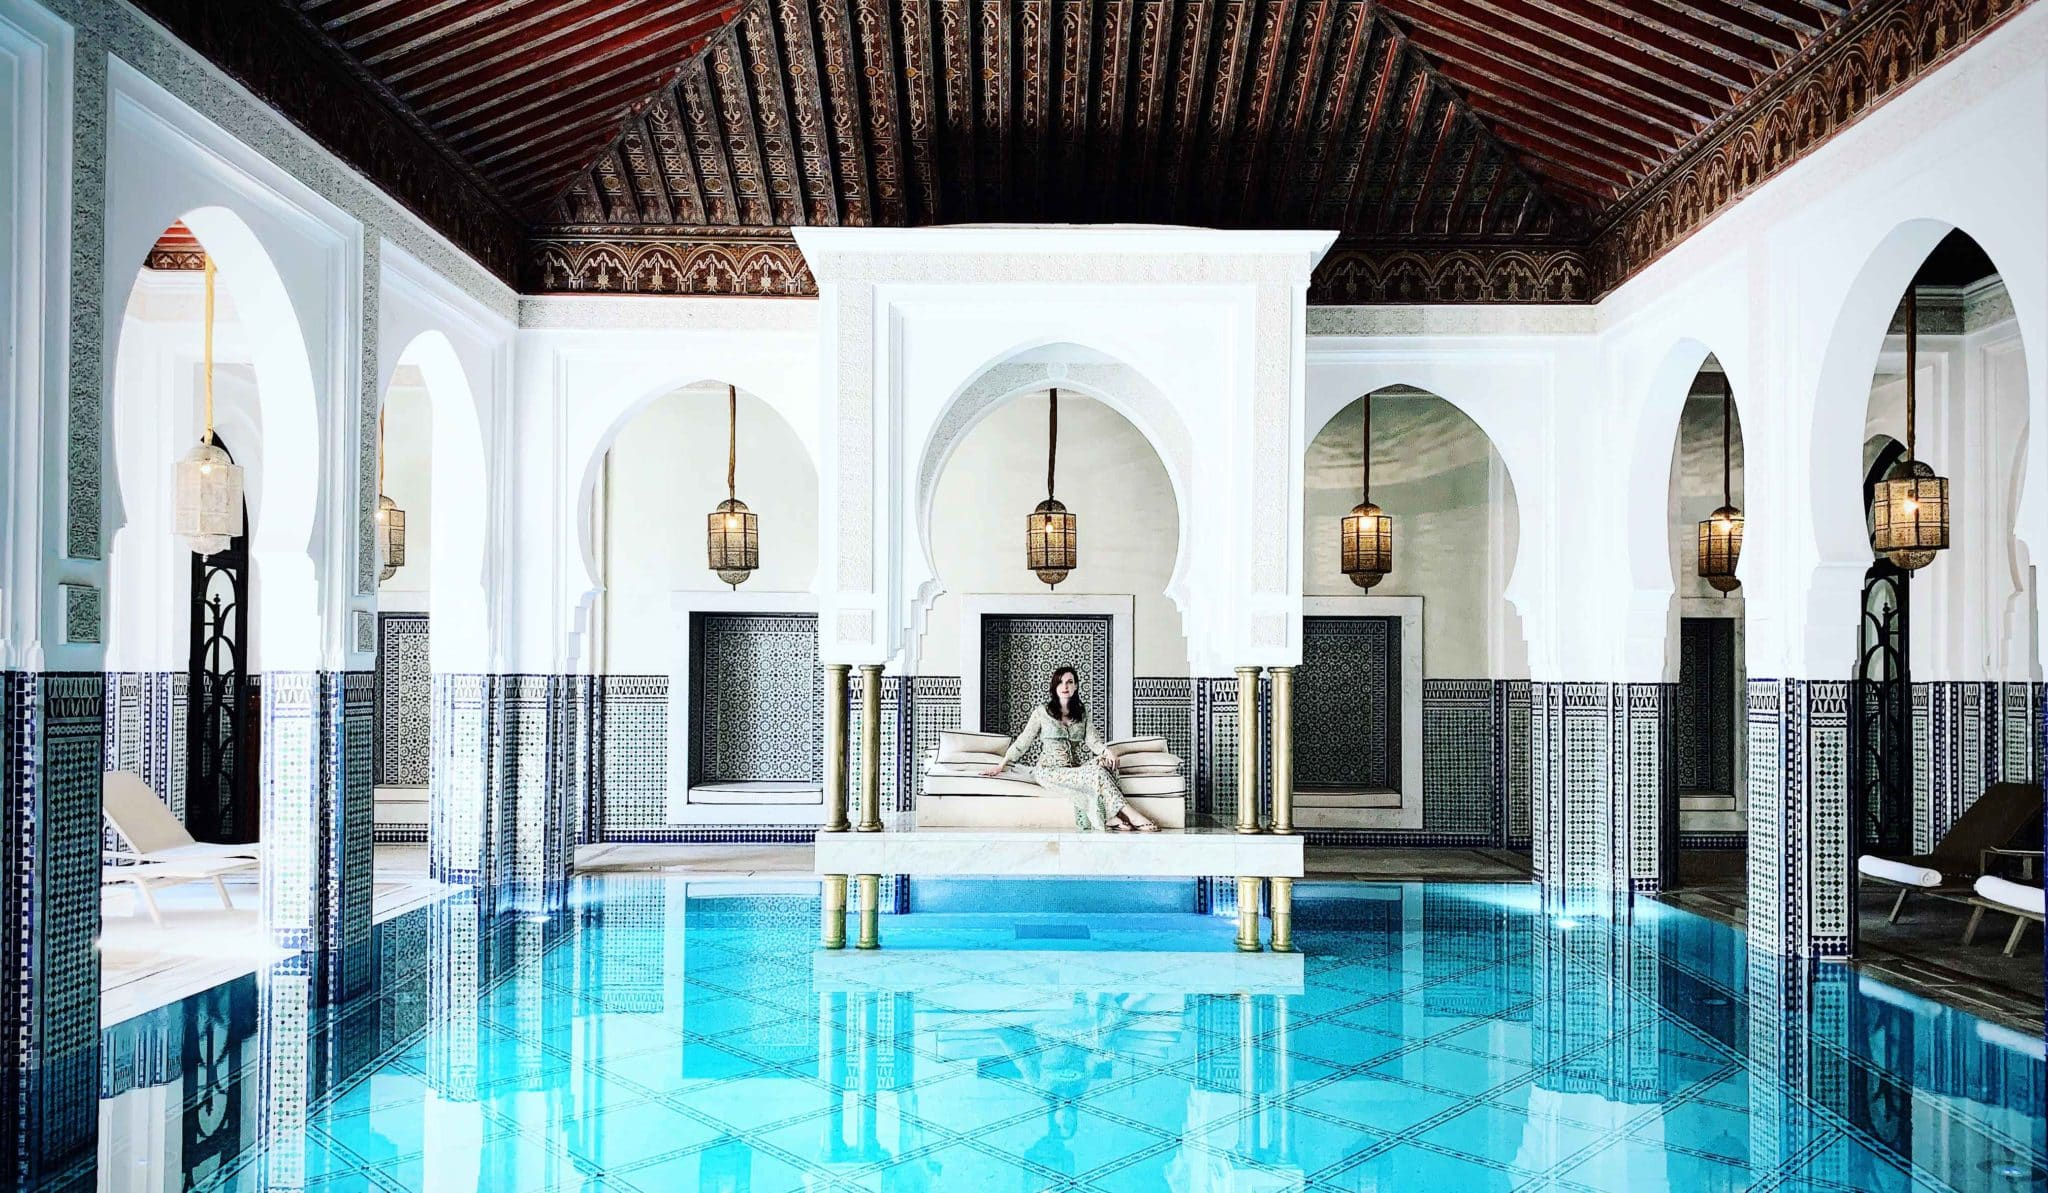 Marrakech Hammam Bain Turc